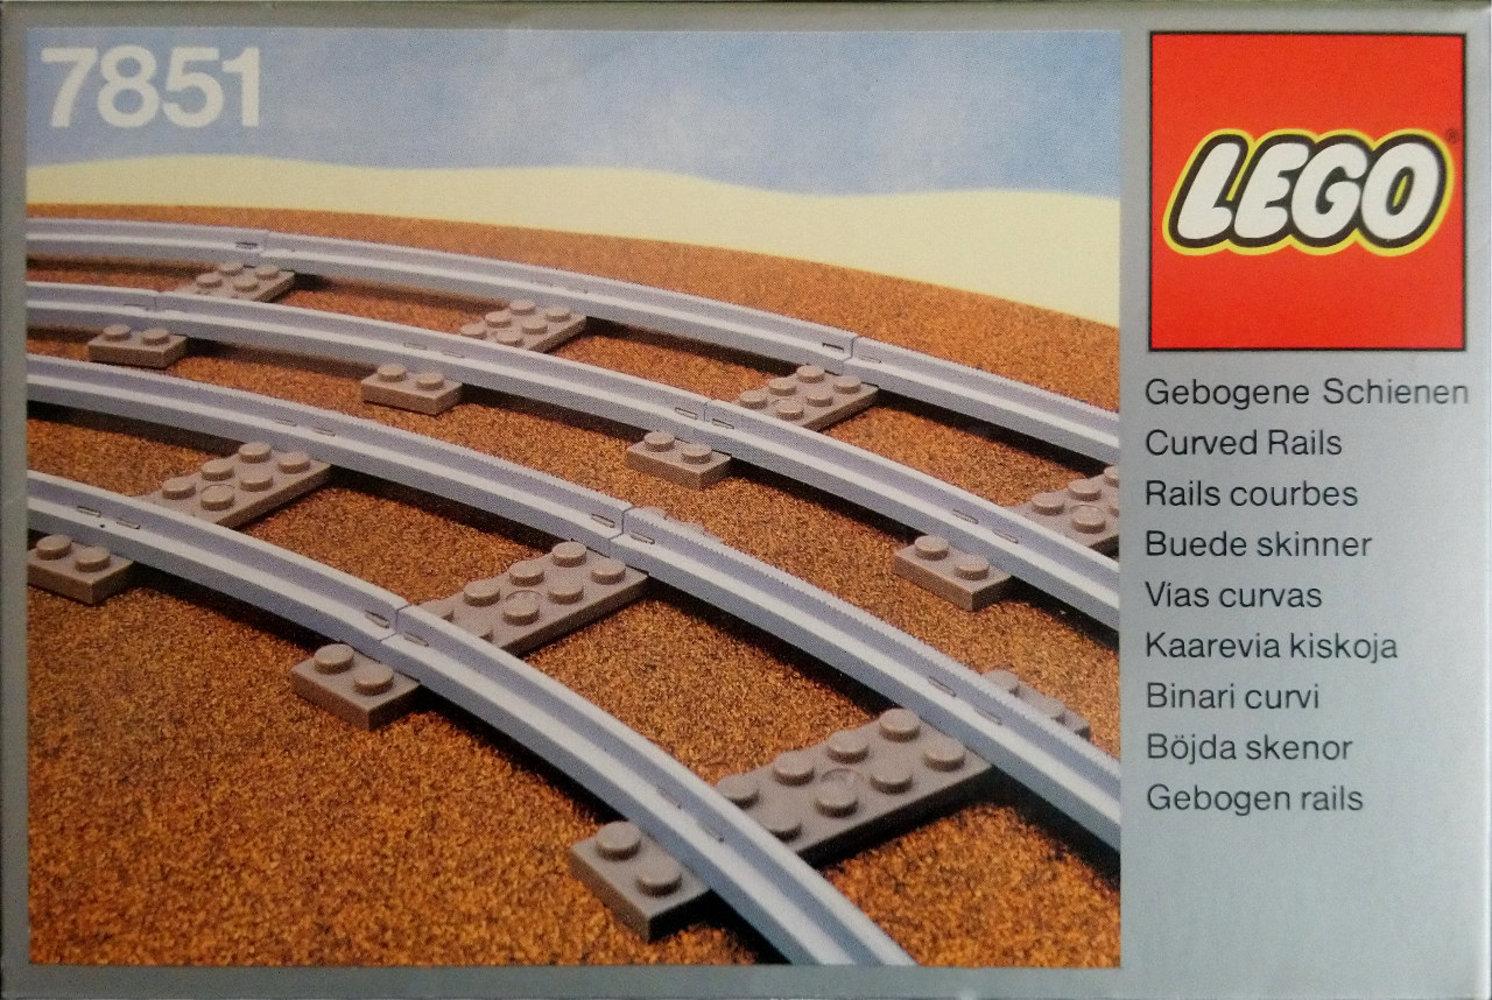 8 Curved Rails Gray 4.5v